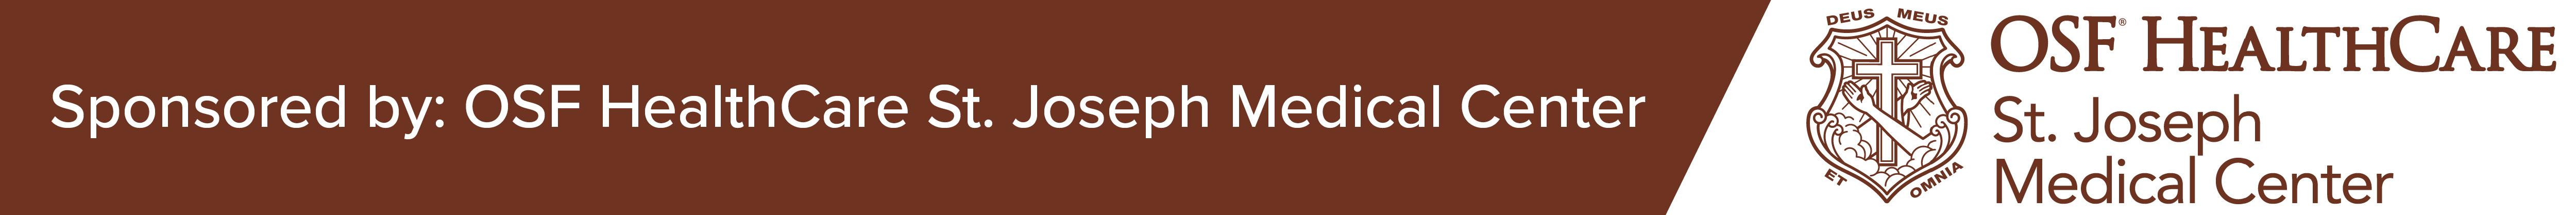 Sponsored by: OSF HealthCare St. Joseph Medical Center